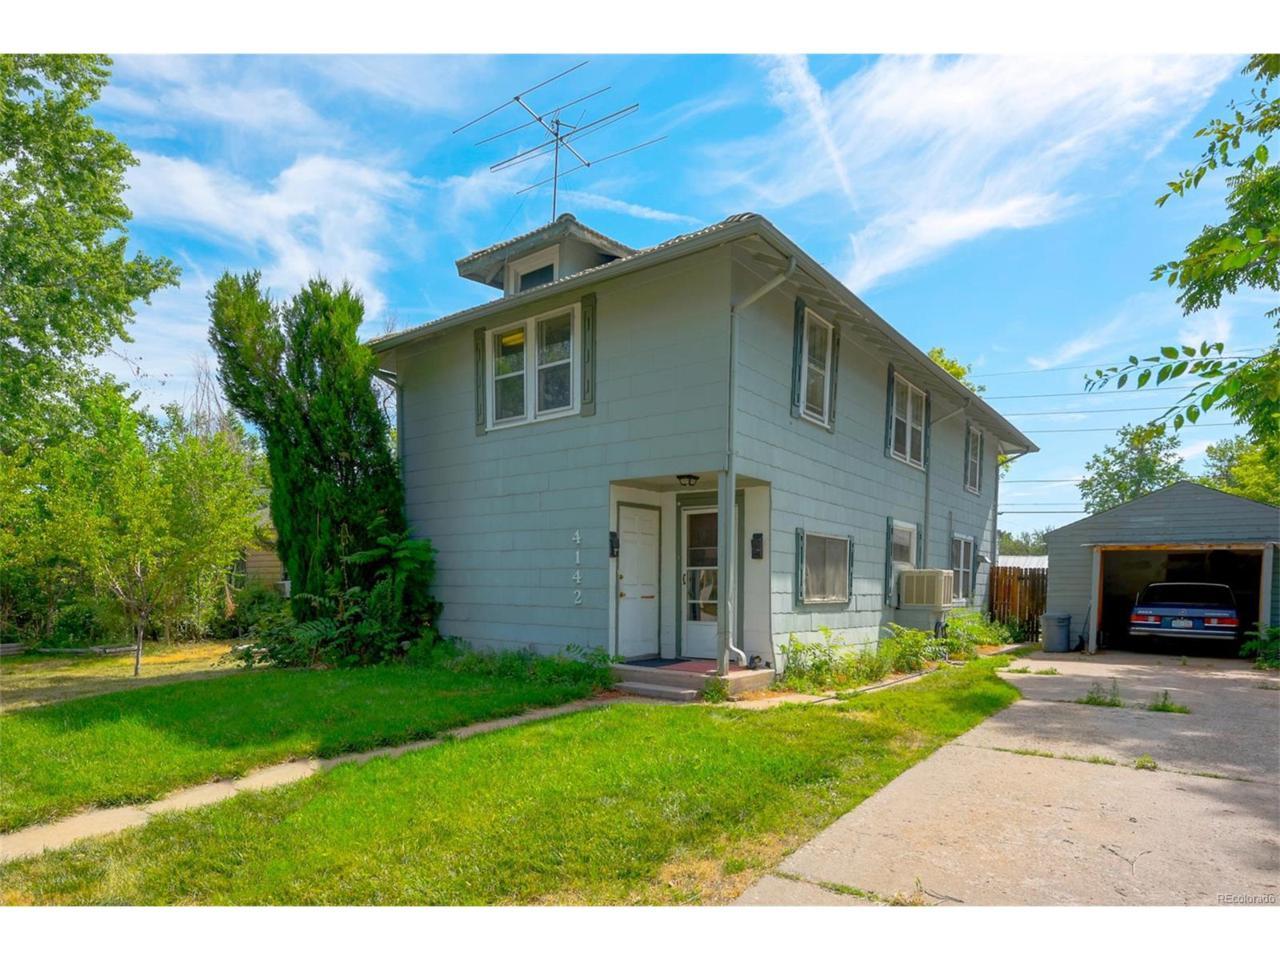 4142 Chase Street, Denver, CO 80212 (MLS #7719626) :: 8z Real Estate